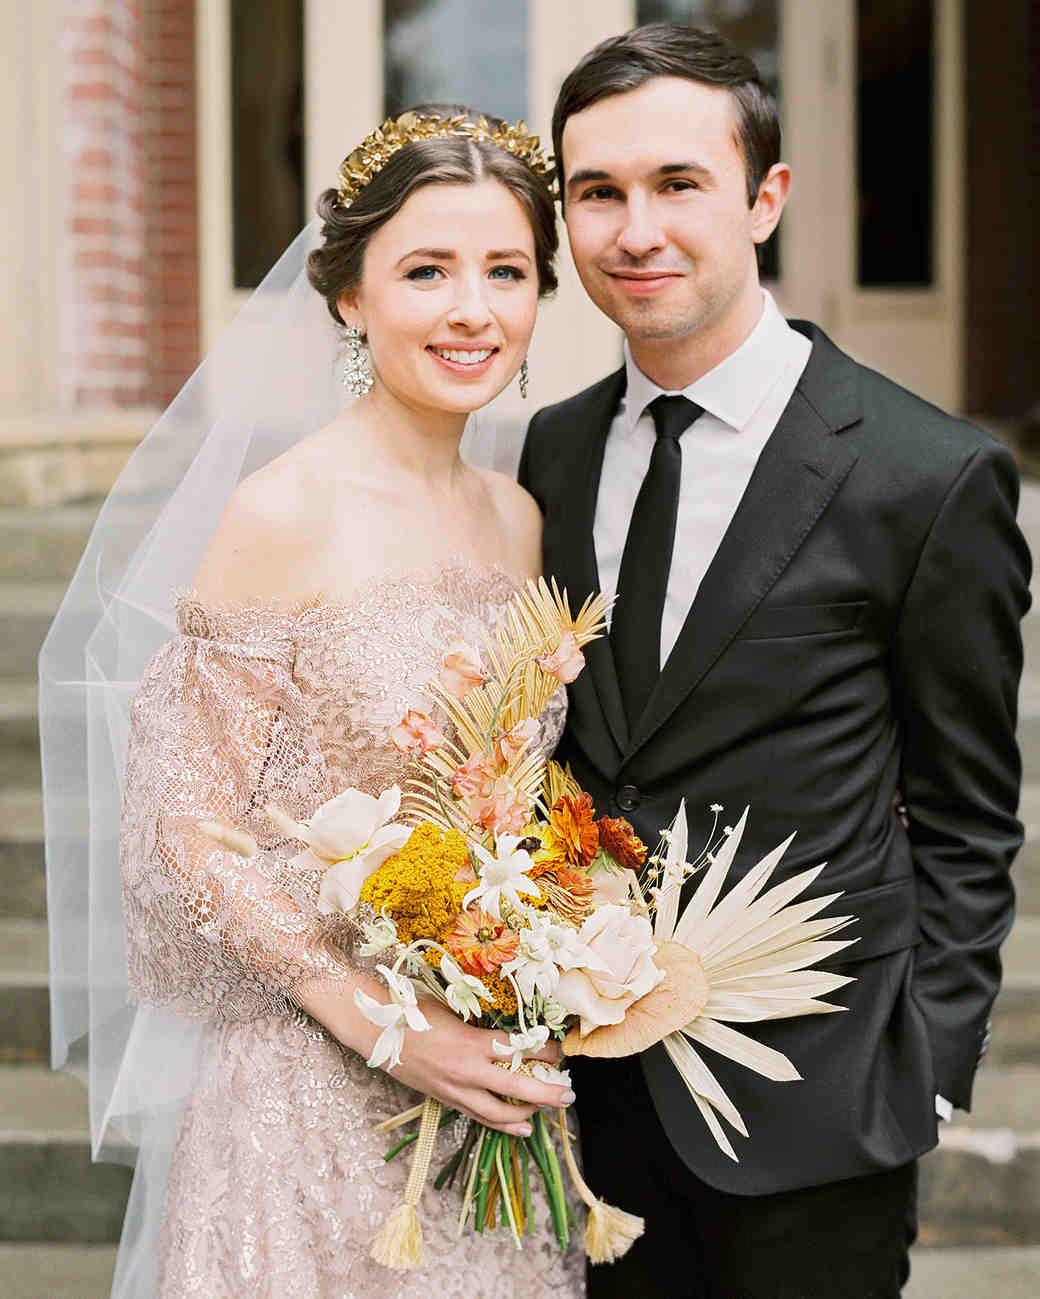 kae danny wedding couple portrait